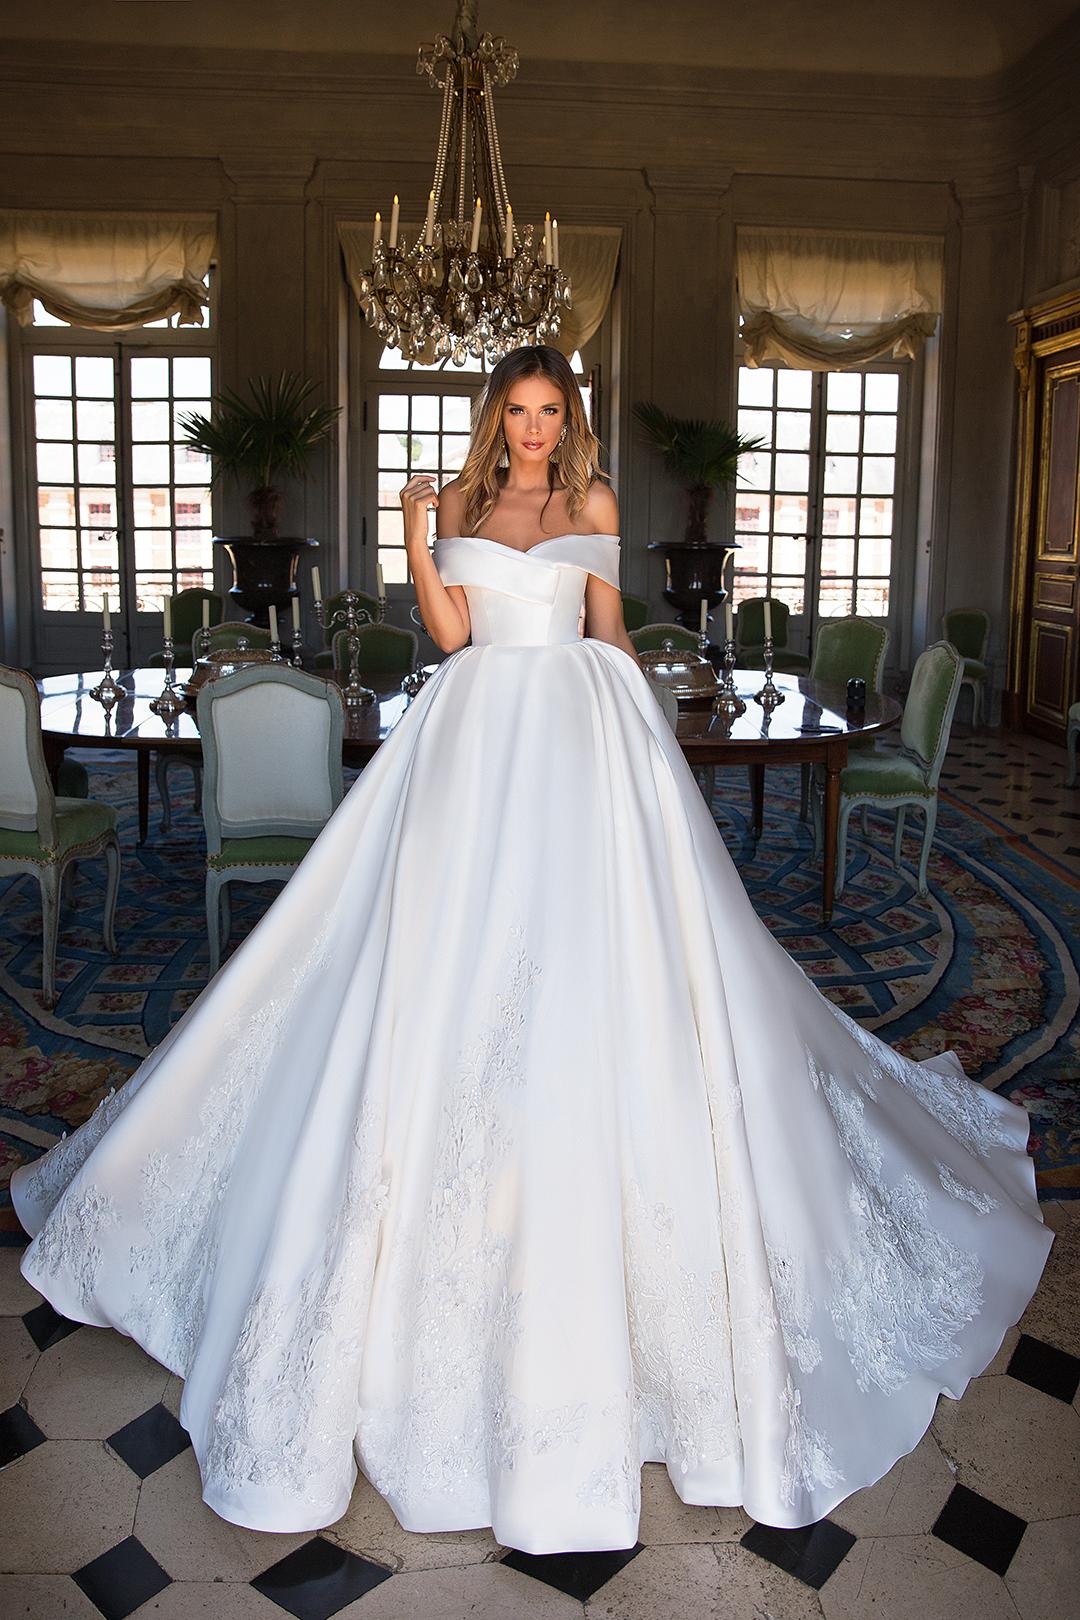 Blushing Bridal Boutique ,MillaNova, Virginia, once in the palaceillusion-bridal-wedding-wedding gown-woodbridge-vaughan-mississauga-toronto-gta-ontario-canada